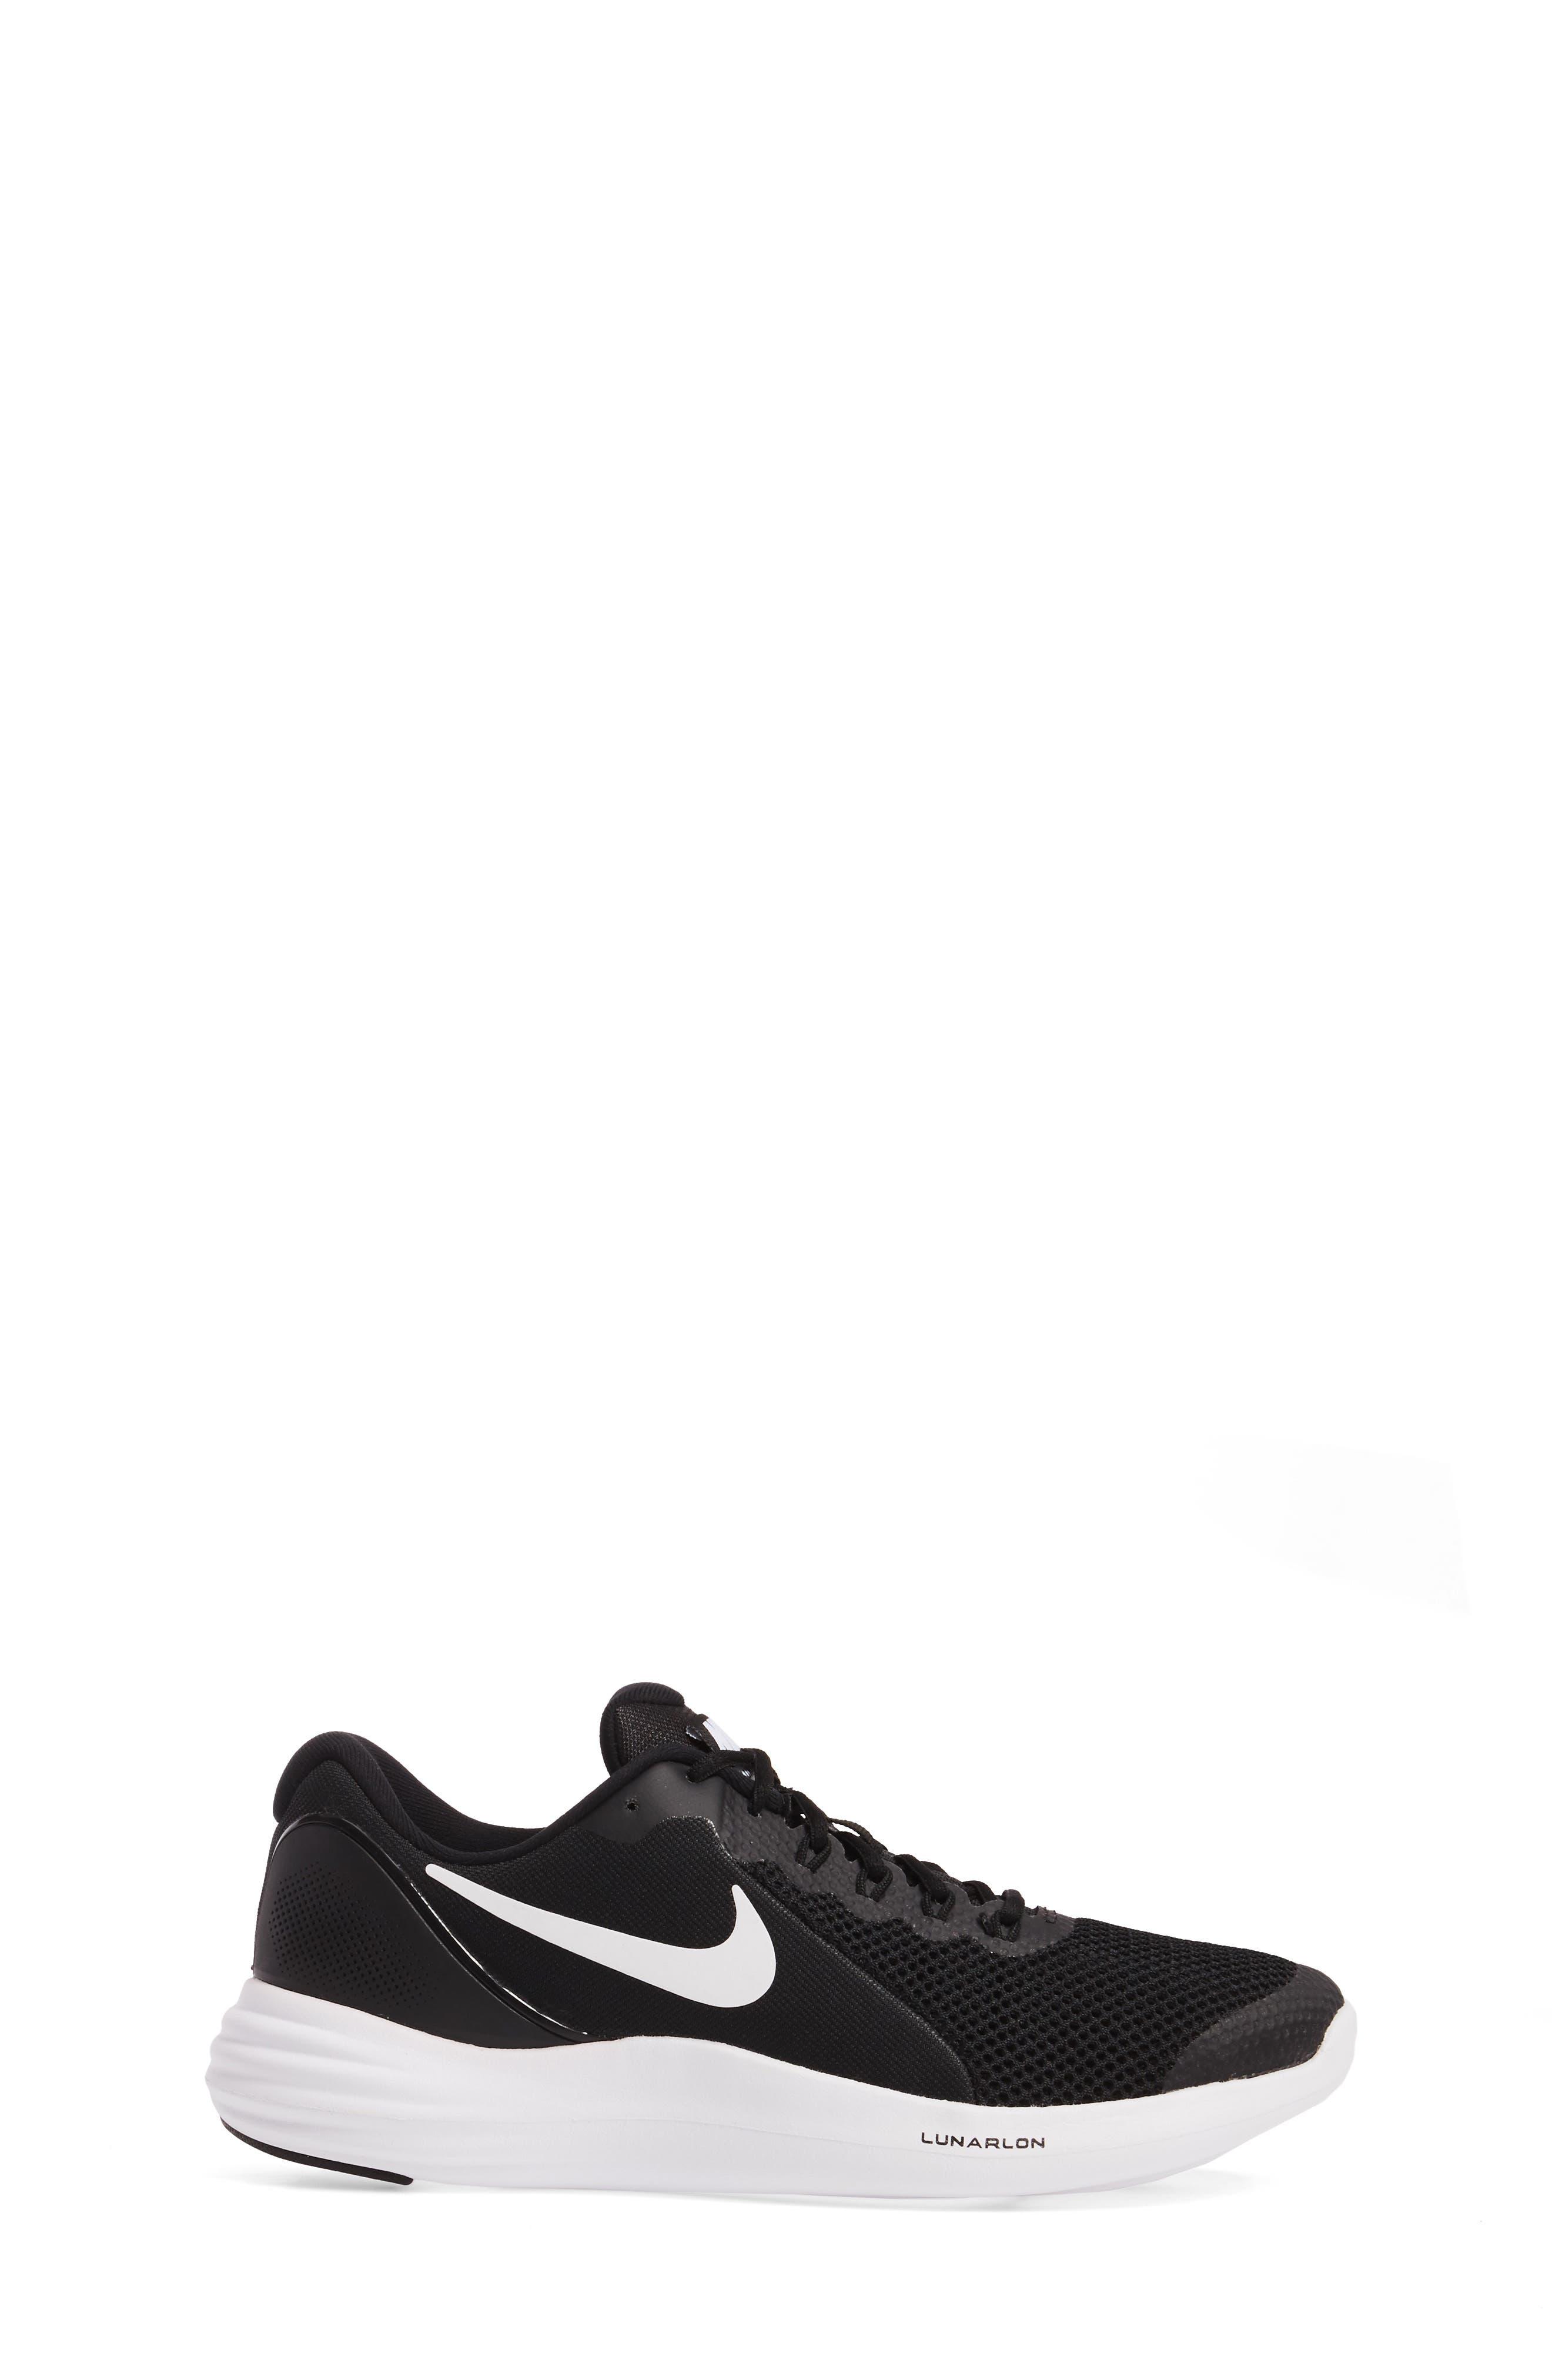 Lunar Apparent Sneaker,                             Alternate thumbnail 3, color,                             004